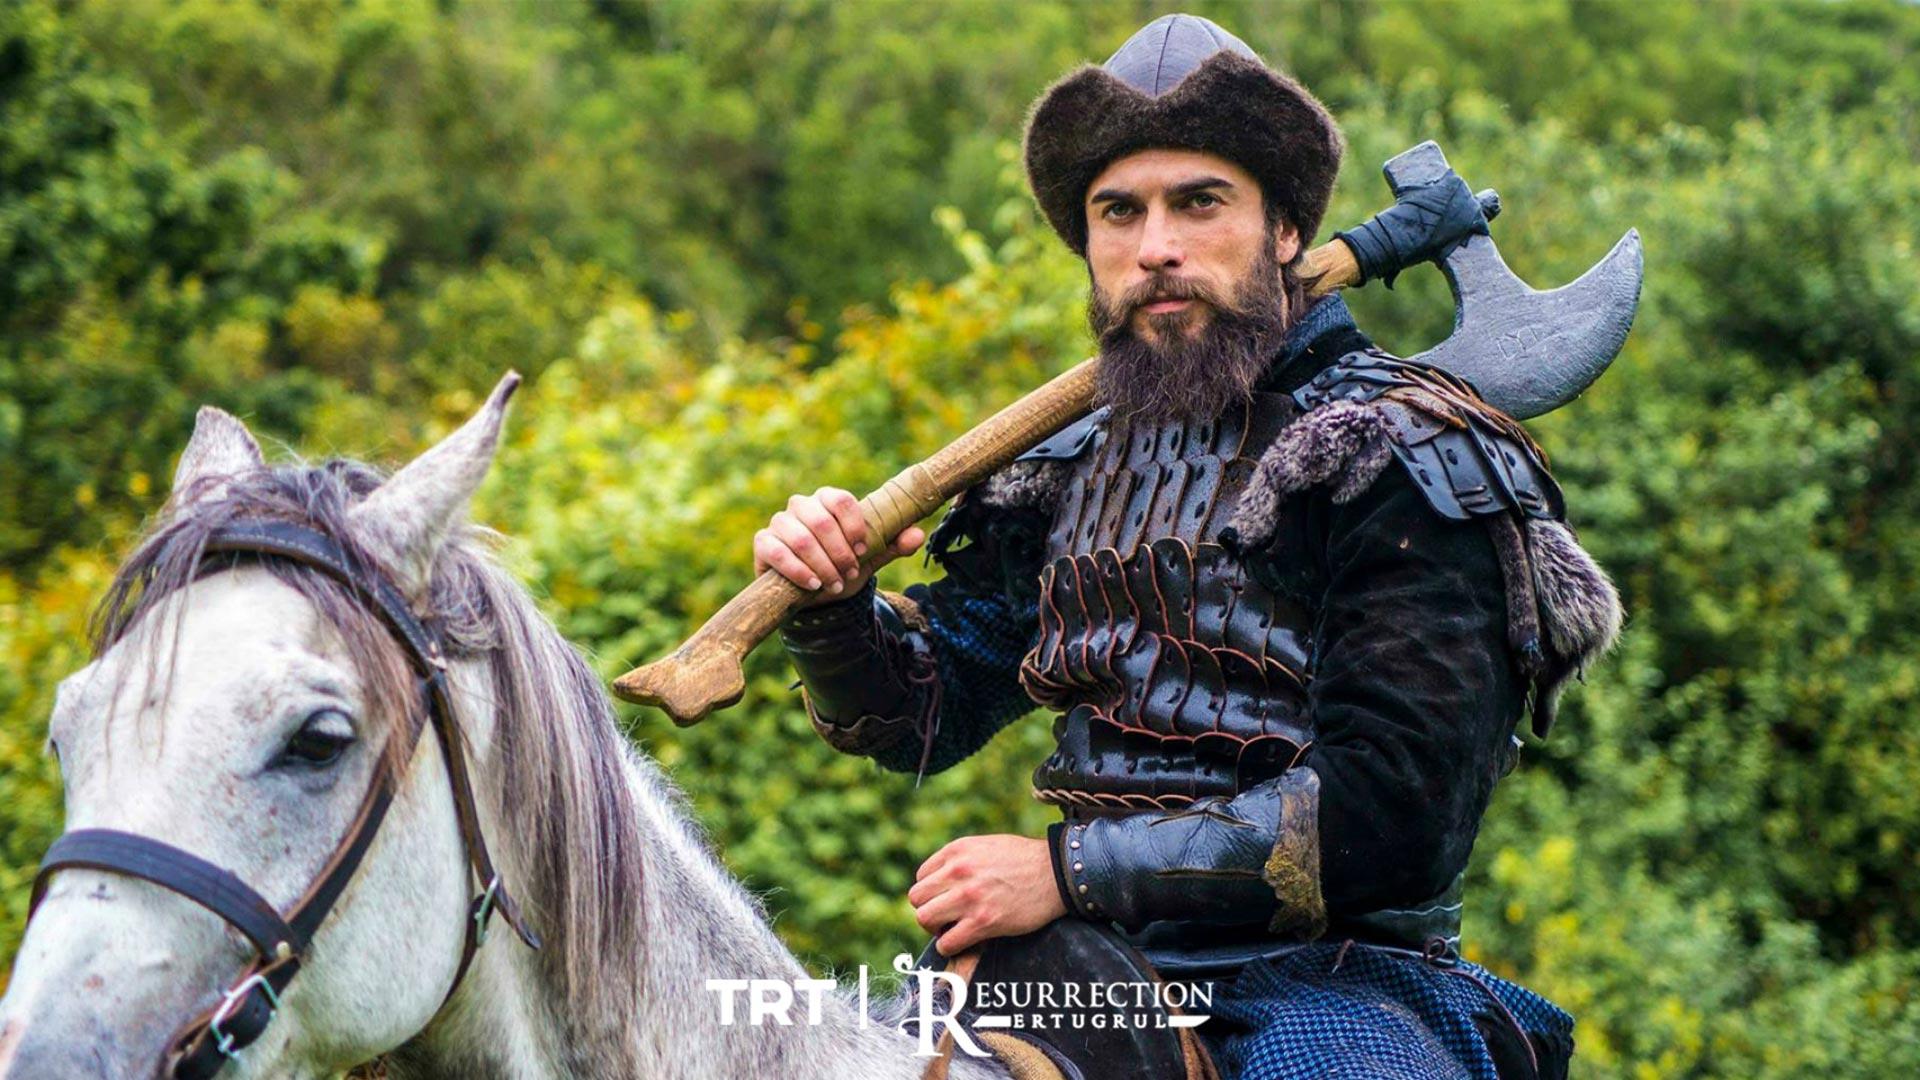 Resurrection: Etrtugal Turkish TV Shows